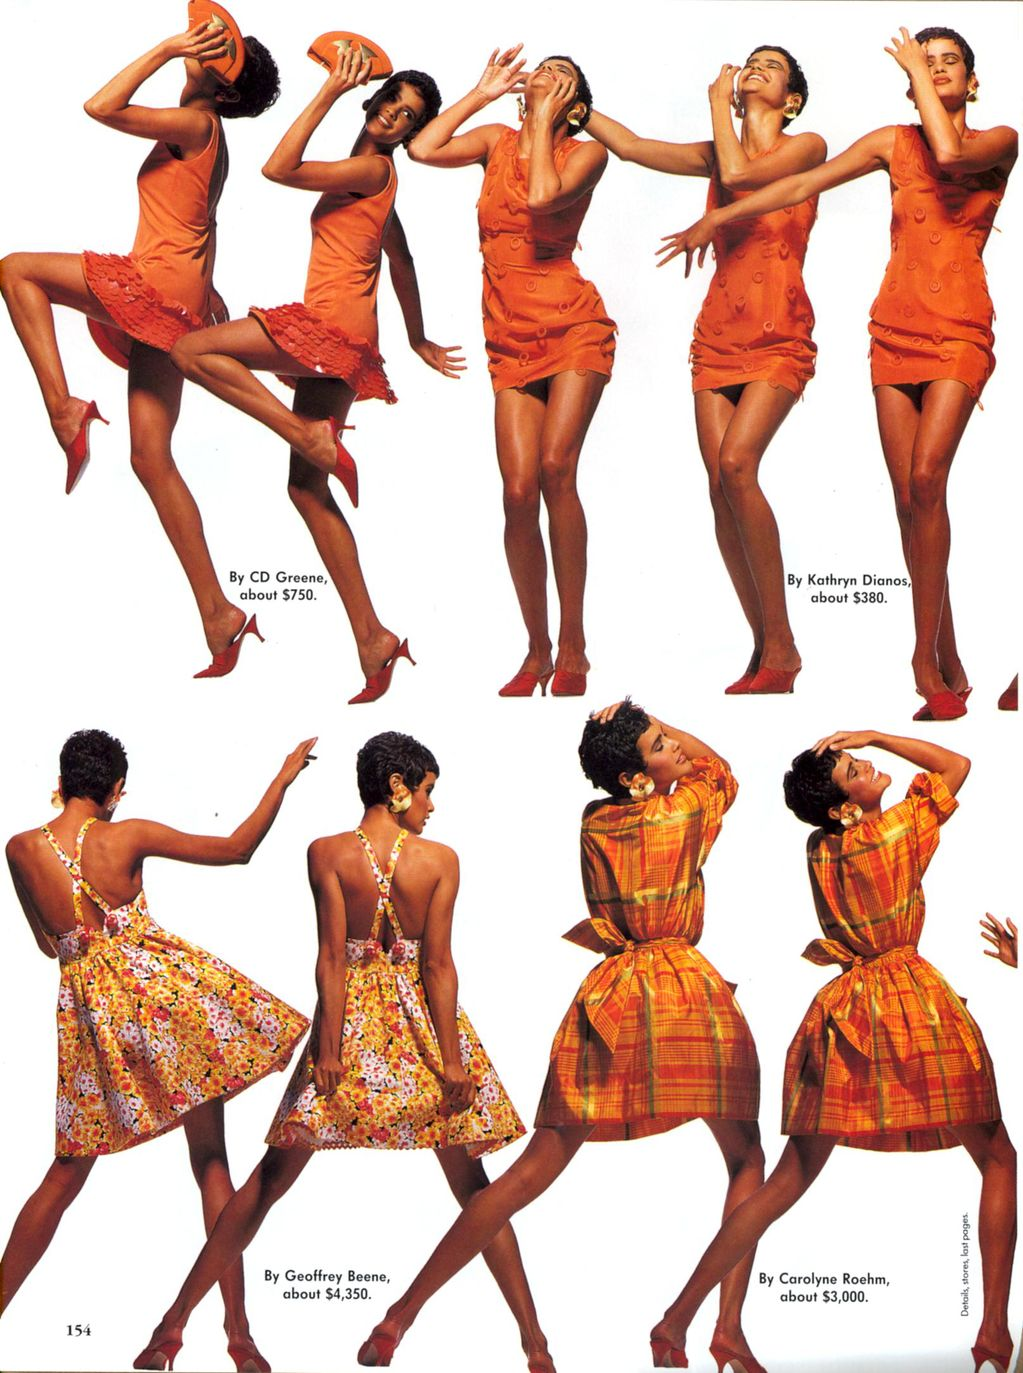 Vogue January 1991 | Great Buys - Dress Rehearsal 03.jpg